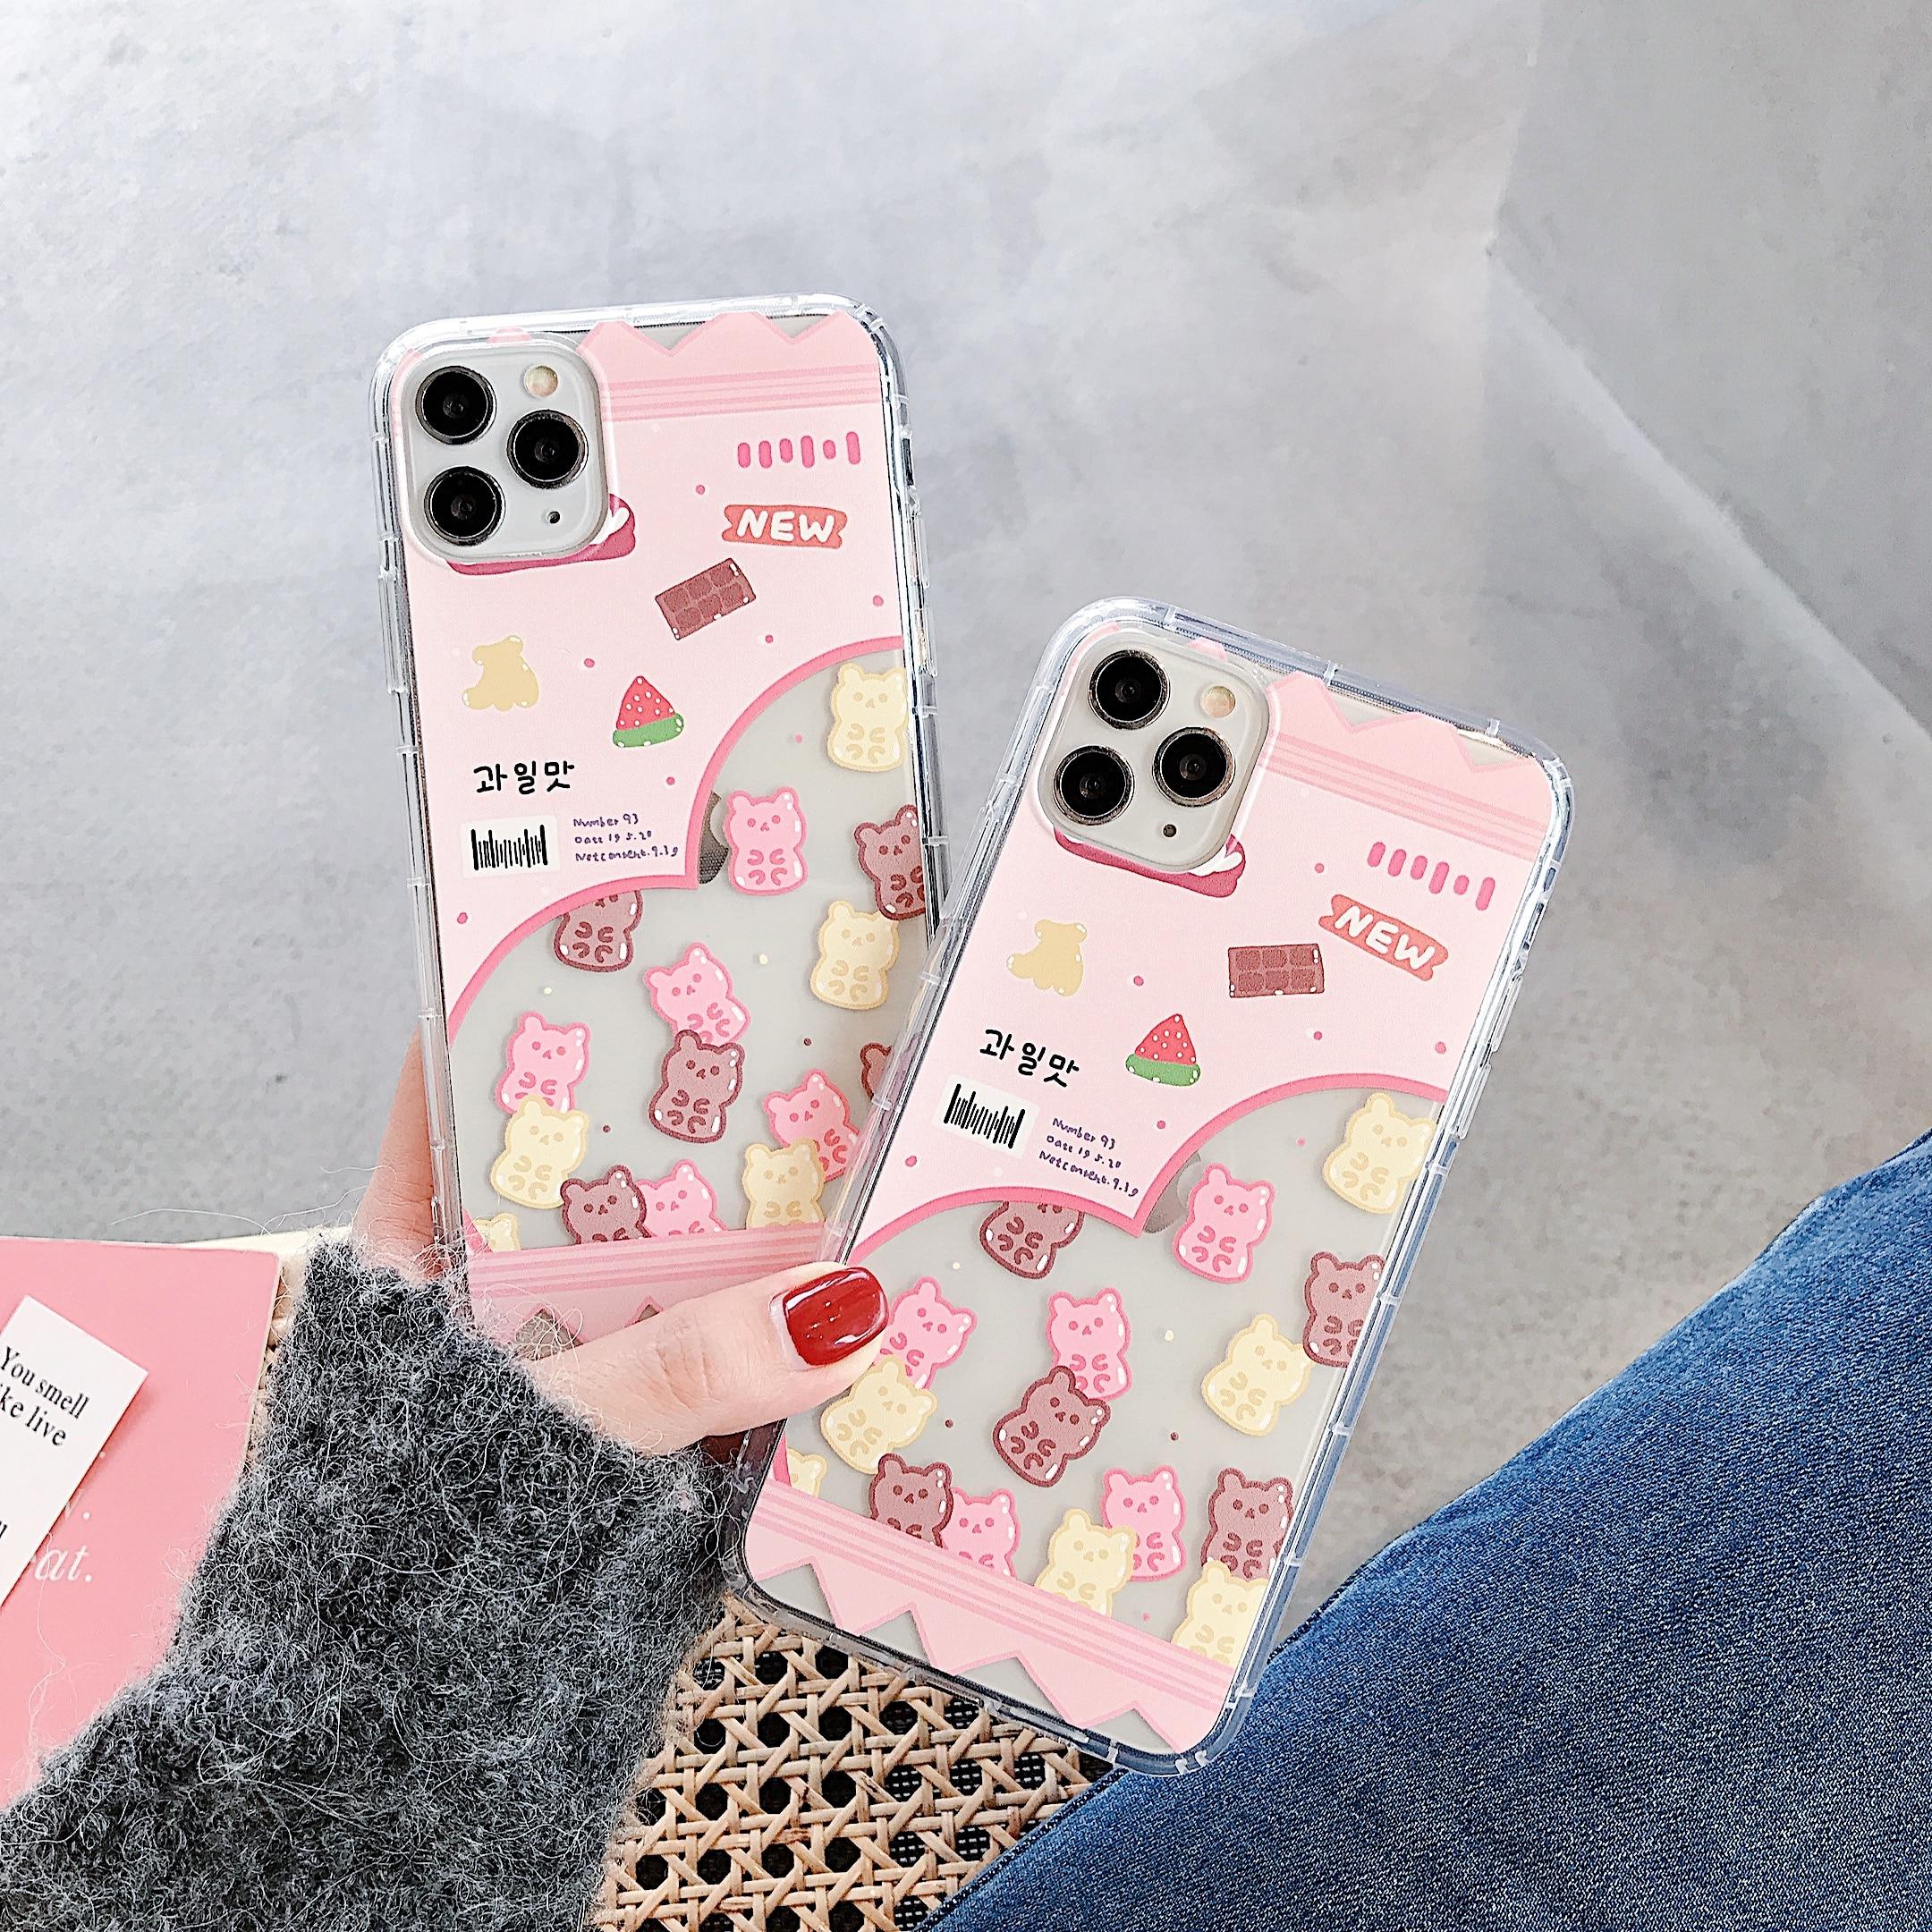 INS Korea Stil Rosa Bär Telefon Abdeckung Für Xiaomi Mi 8 Lite 9 SE 6X CC9 CC9E Redmi Hinweis 8 7 K20 Pro Silikon Weichen TPU Fall Shell